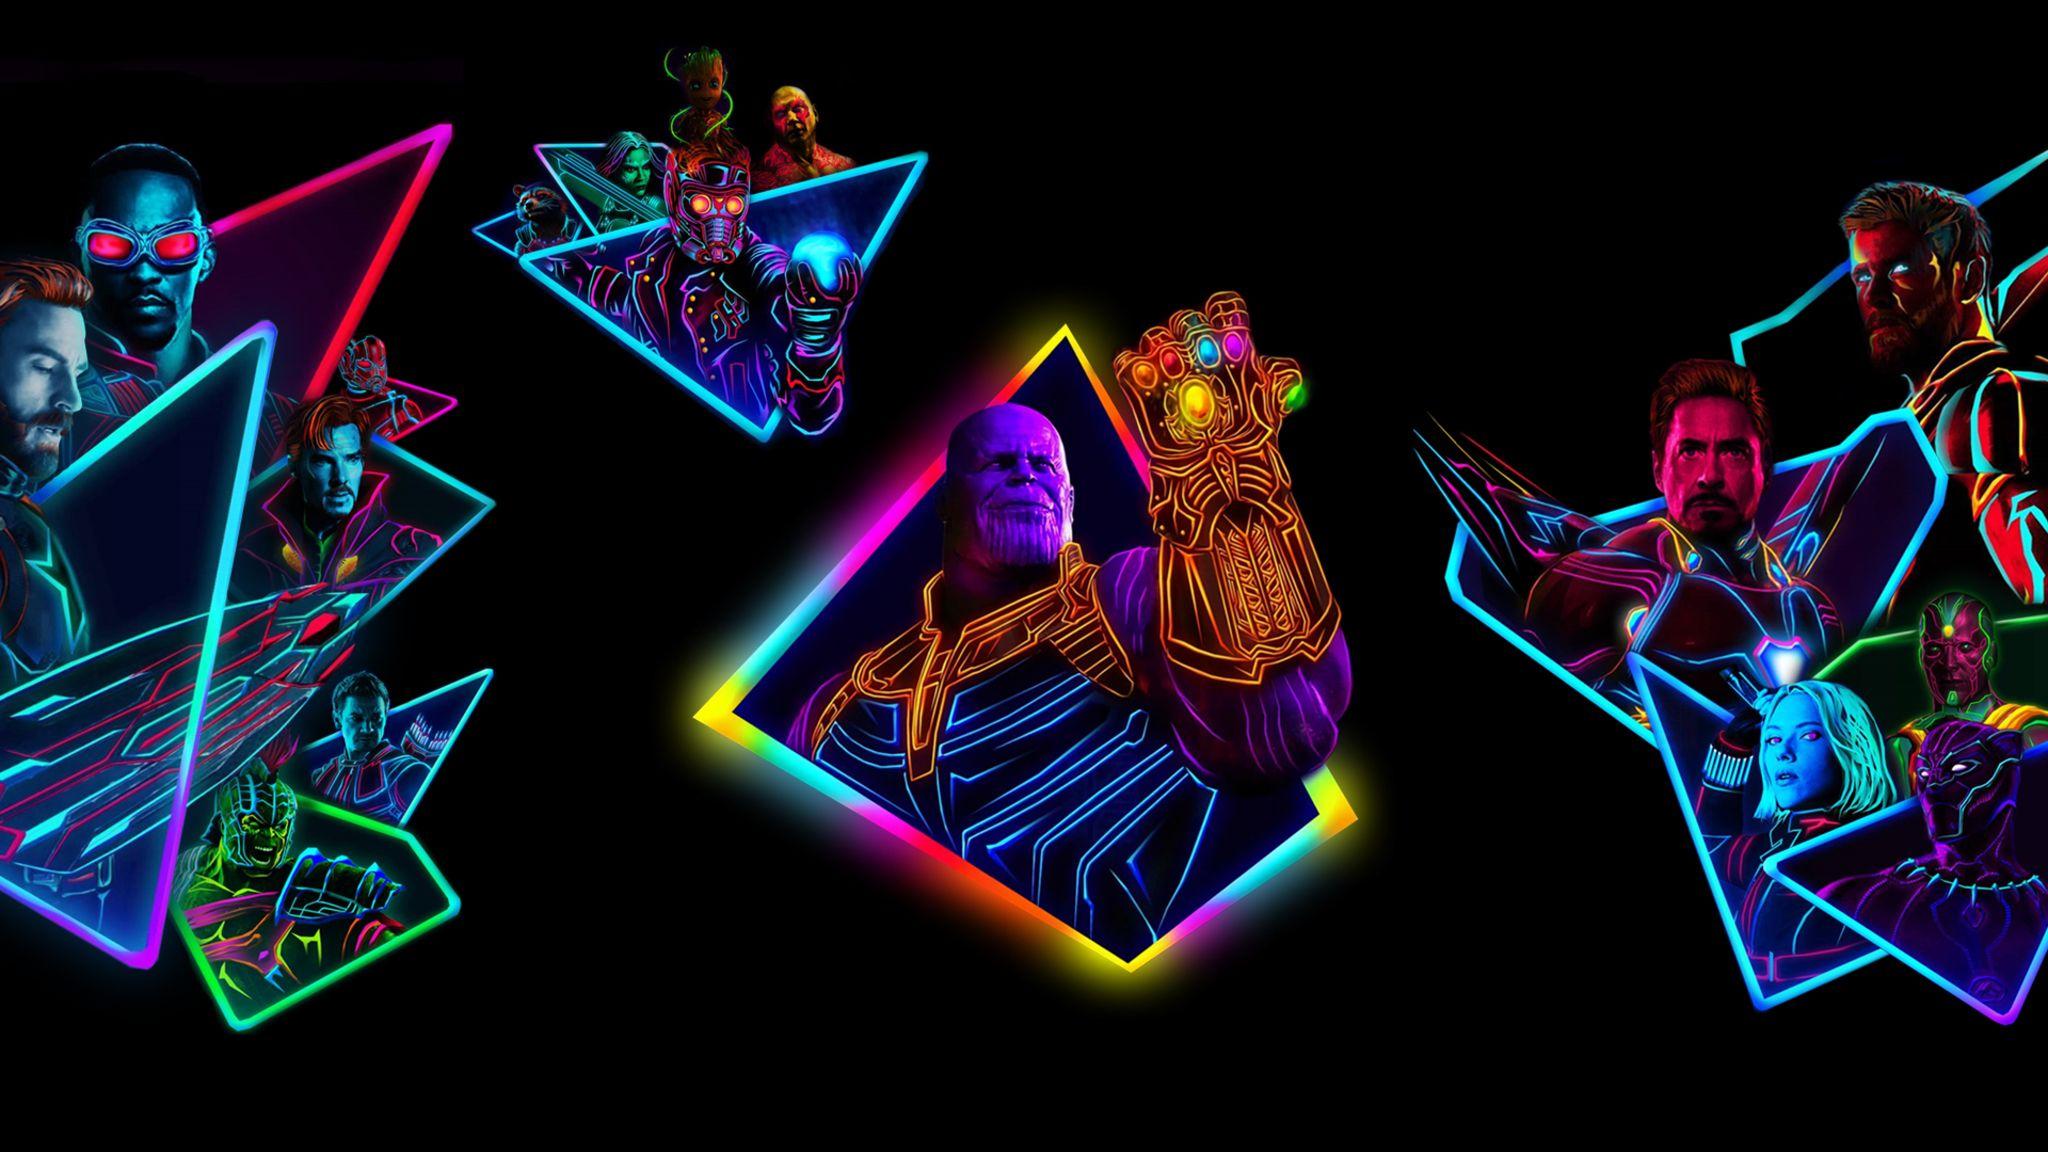 2048x1152 Avengers Infinity War 80s Style Artwork Avengers Neon Infinity War 80s Wallpapers 4k Thanos Artwork In 2020 Neon Wallpaper Hd Cool Wallpapers Avengers